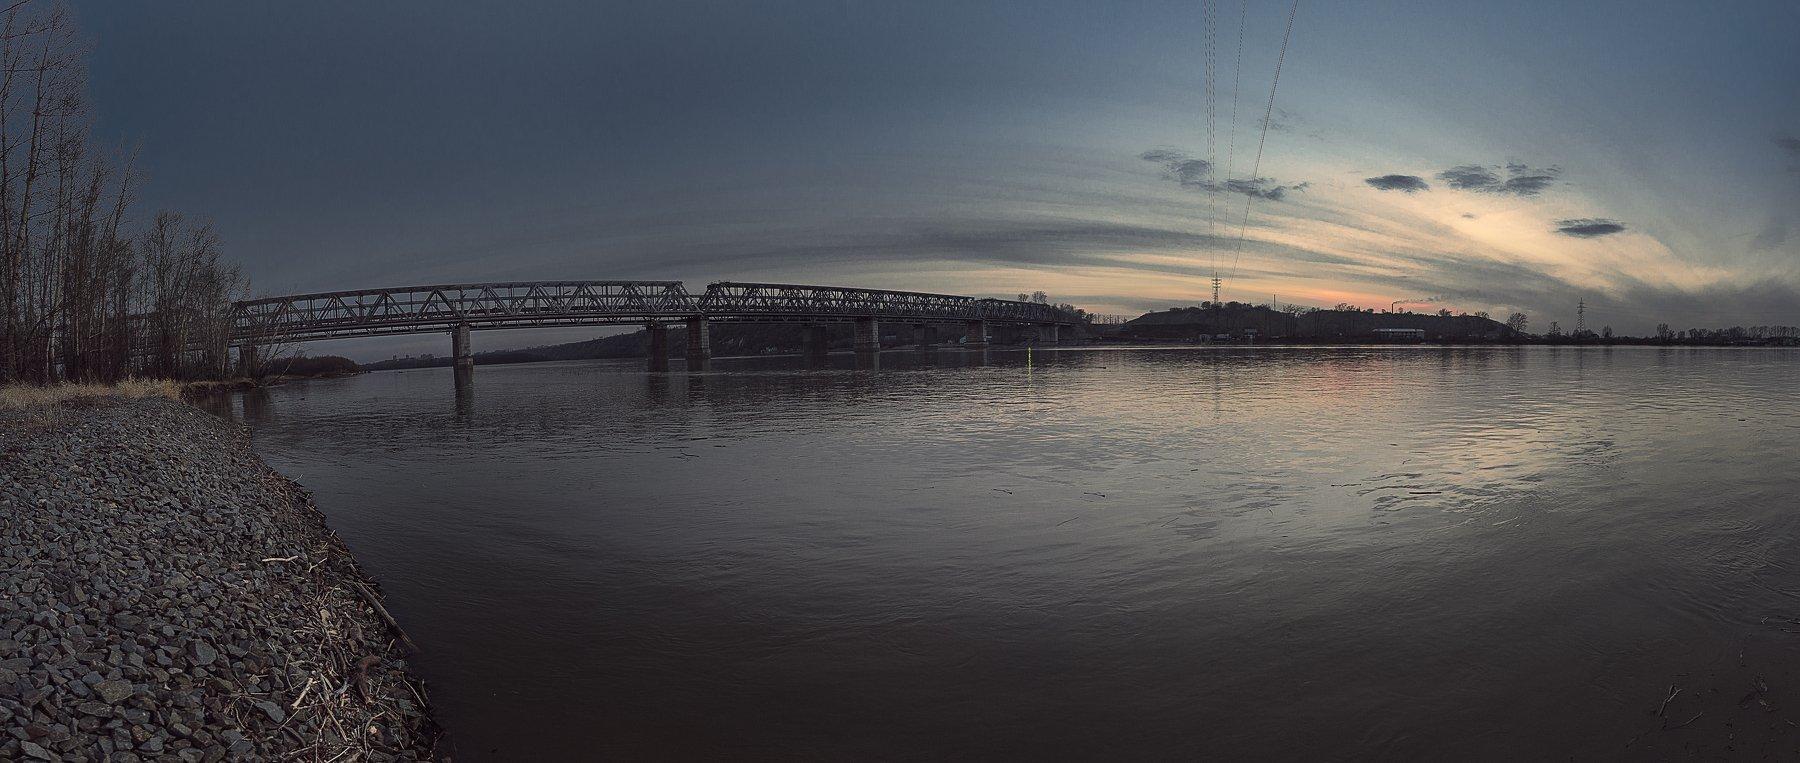 мост, обь, Барнаул, природа, закат, жд,небо, вода, Дмитрий Моисеев